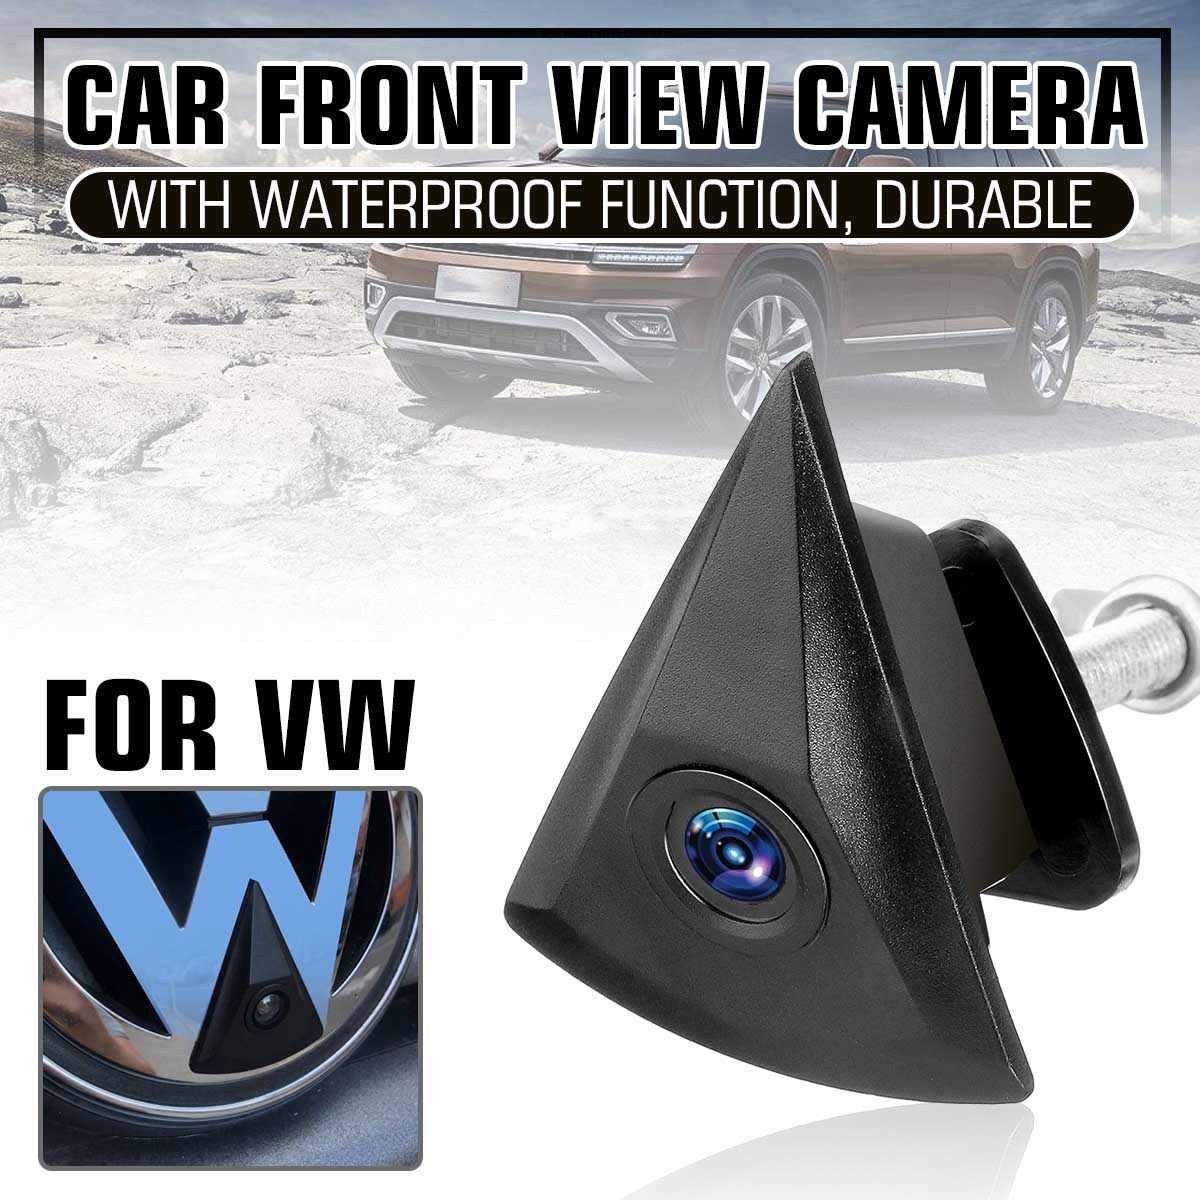 Car Front View Camera For Volkswagen GOLF Jetta Touareg Passat  Polo Tiguan Bora Waterproof Logo Embedded For VW Sedan Beetle T5